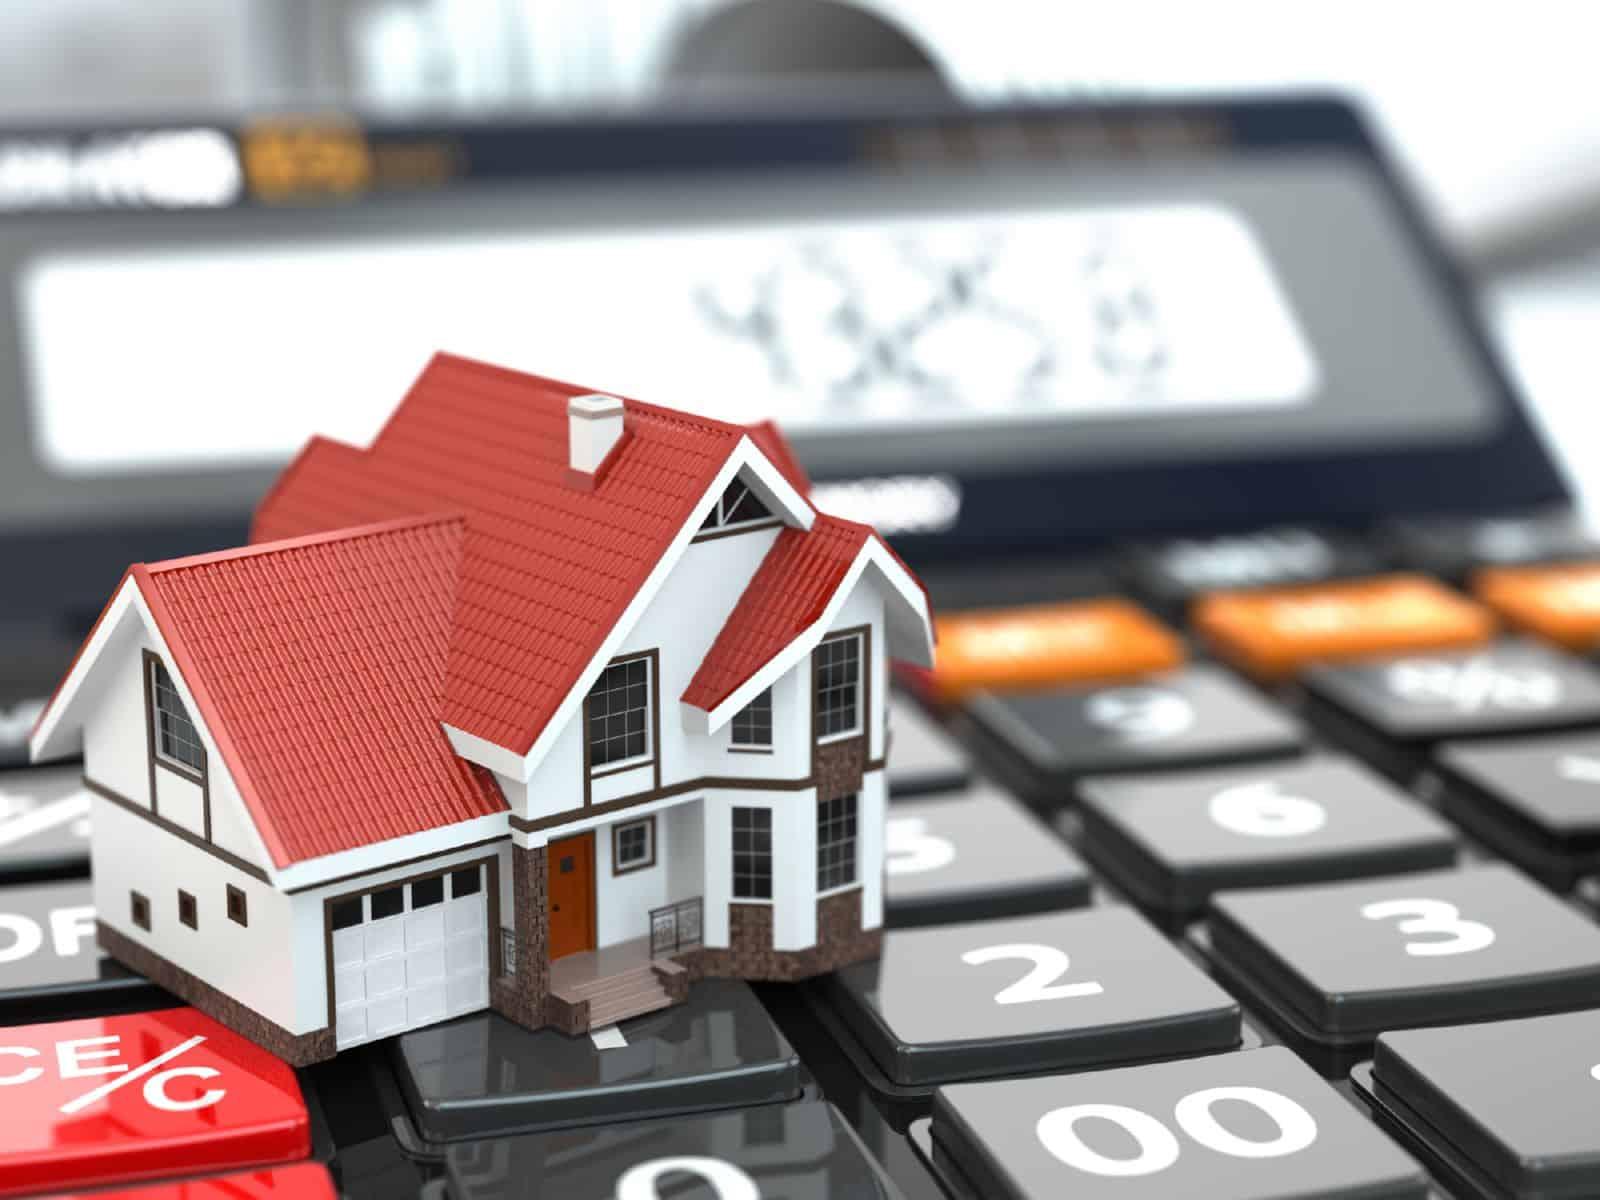 ипотека и ипотеки плюс который таким